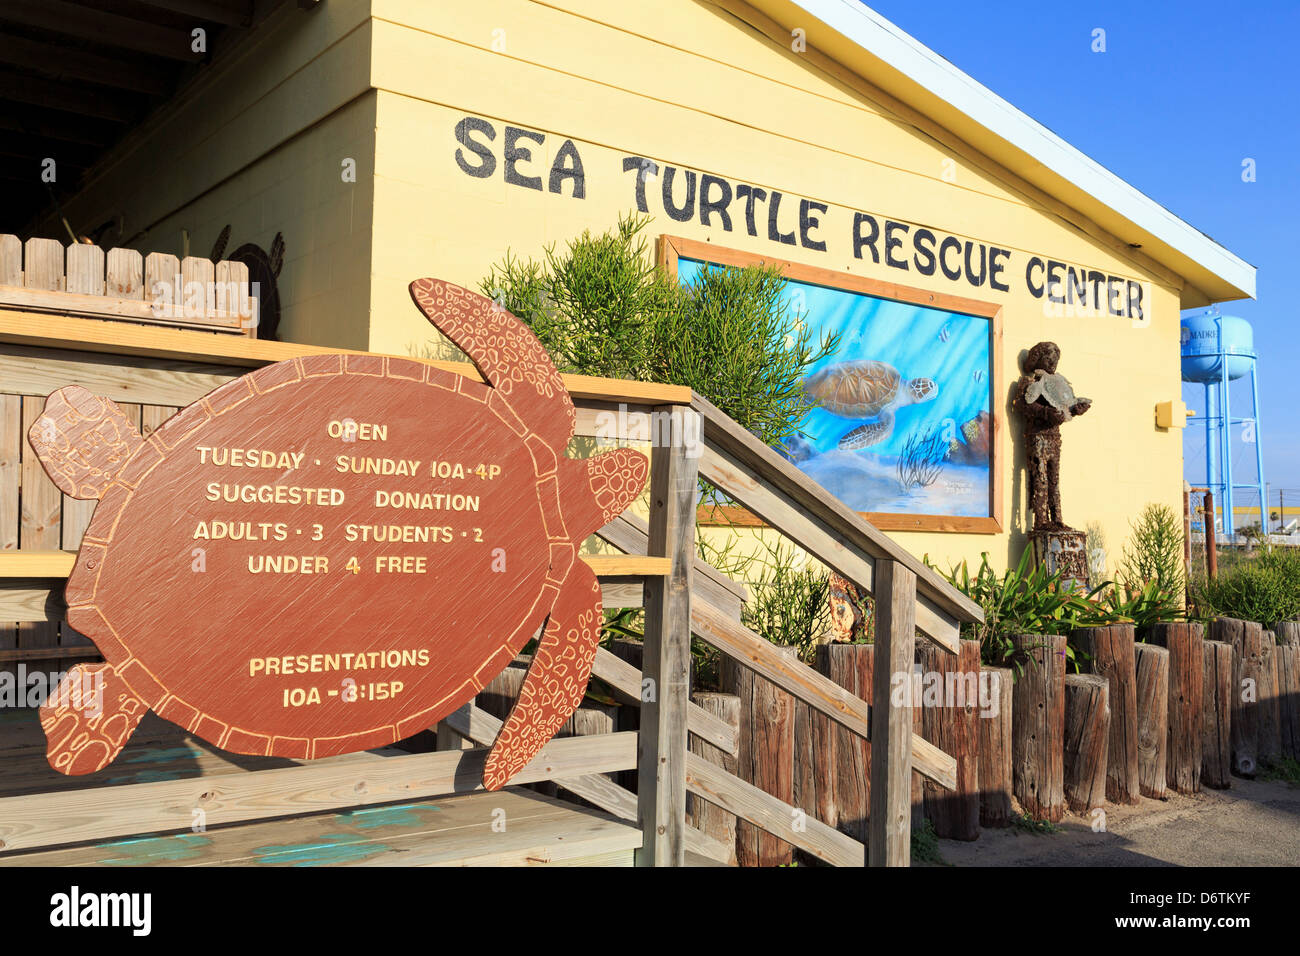 South Padre Island Sea Turtle Resuce